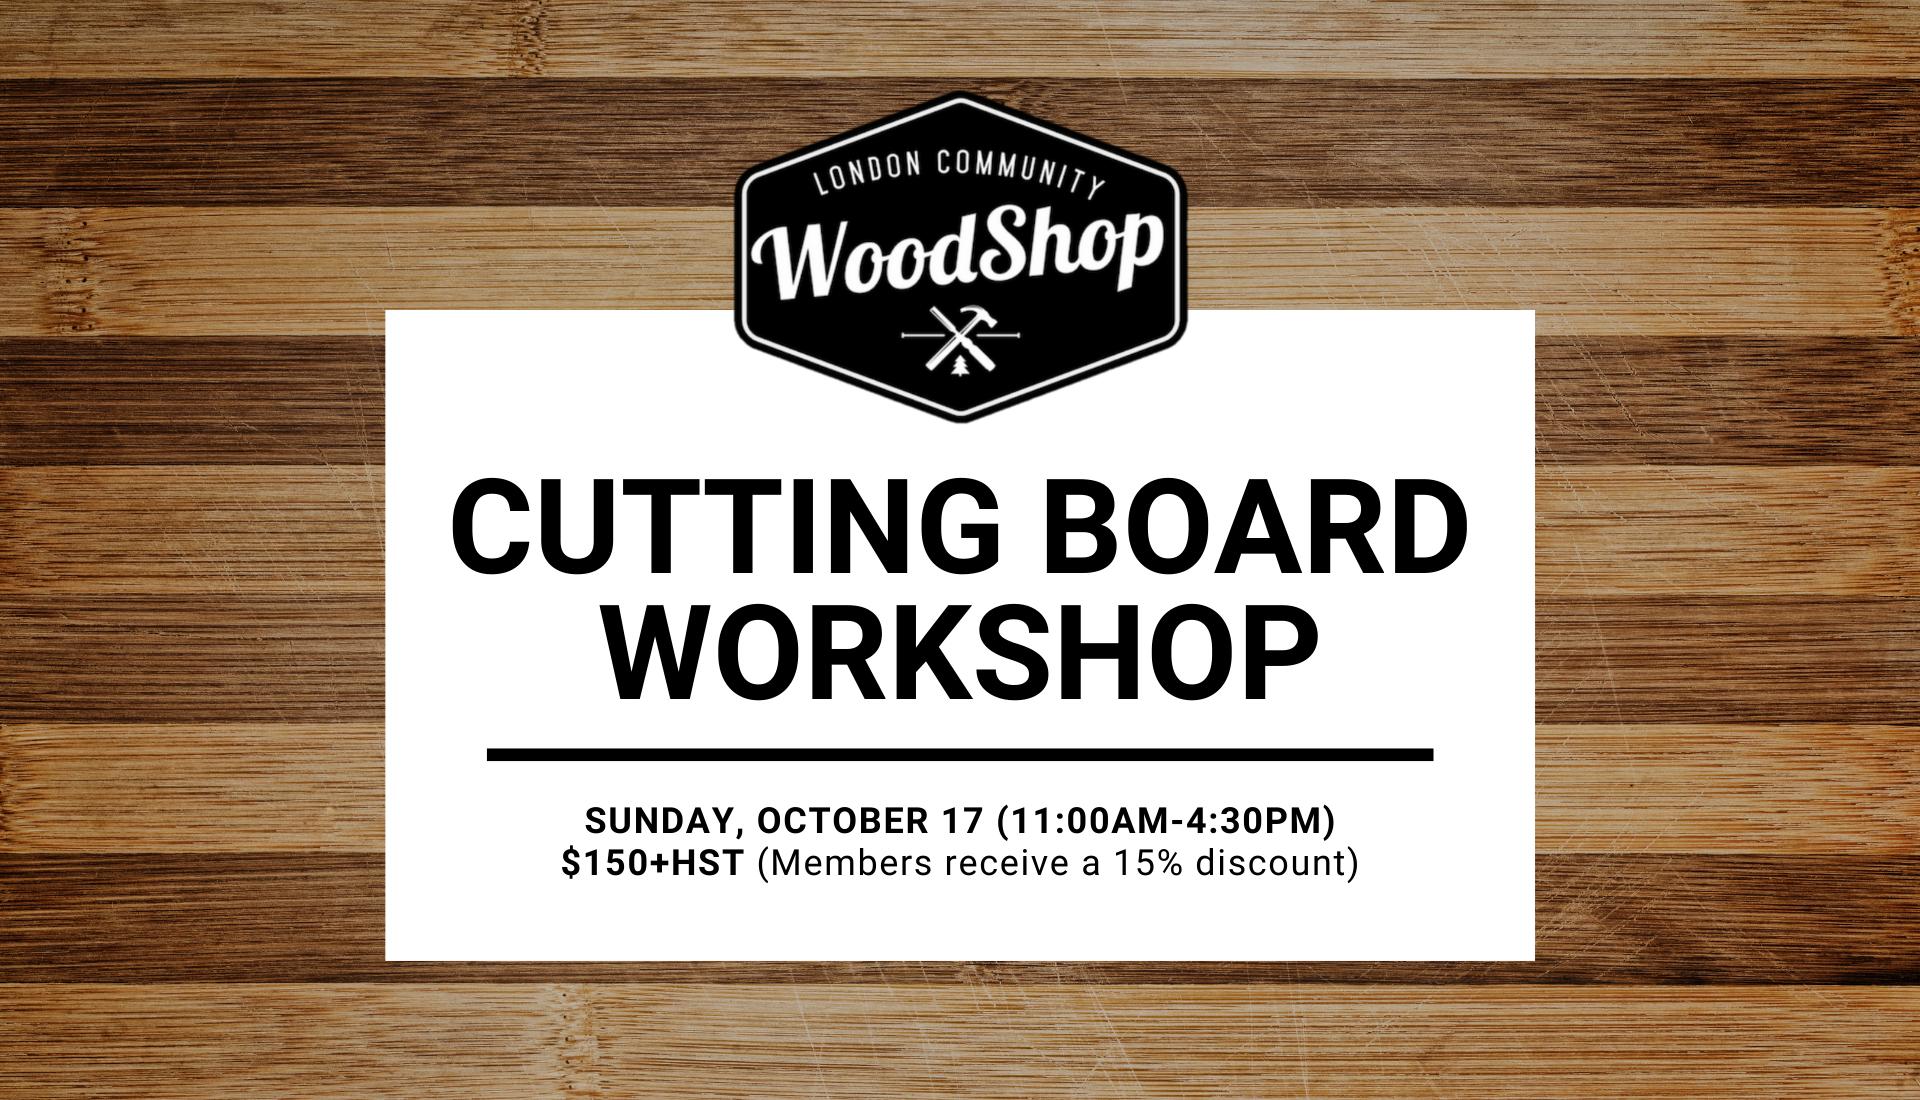 Cutting Board Workshop - Sunday, October 17